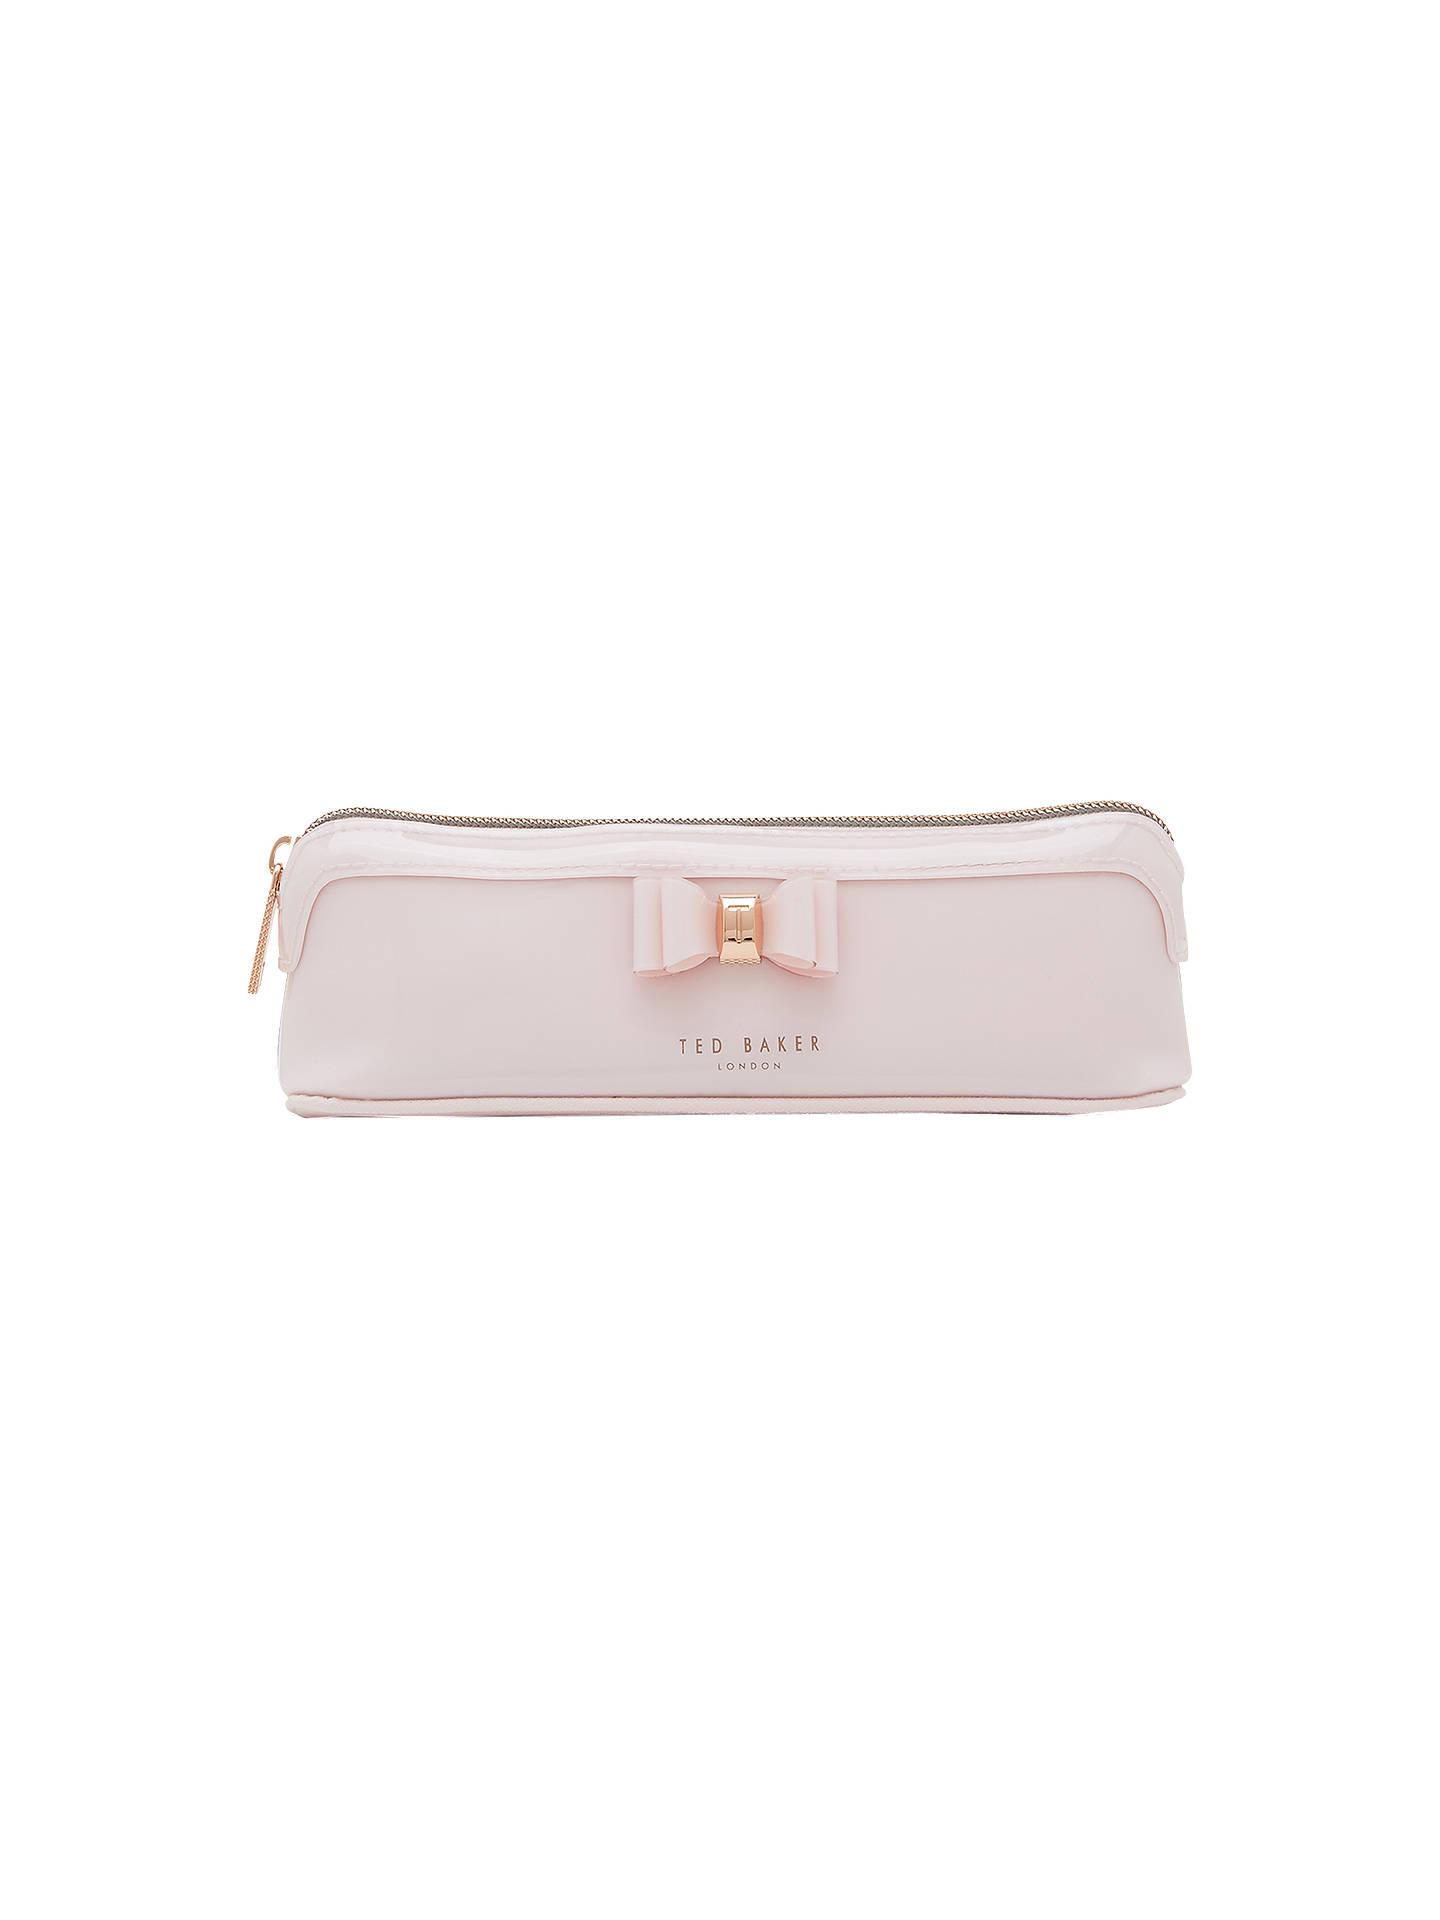 buy online 58fb2 ef679 Ted Baker Jass Bow Pencil Case, Dusky Pink